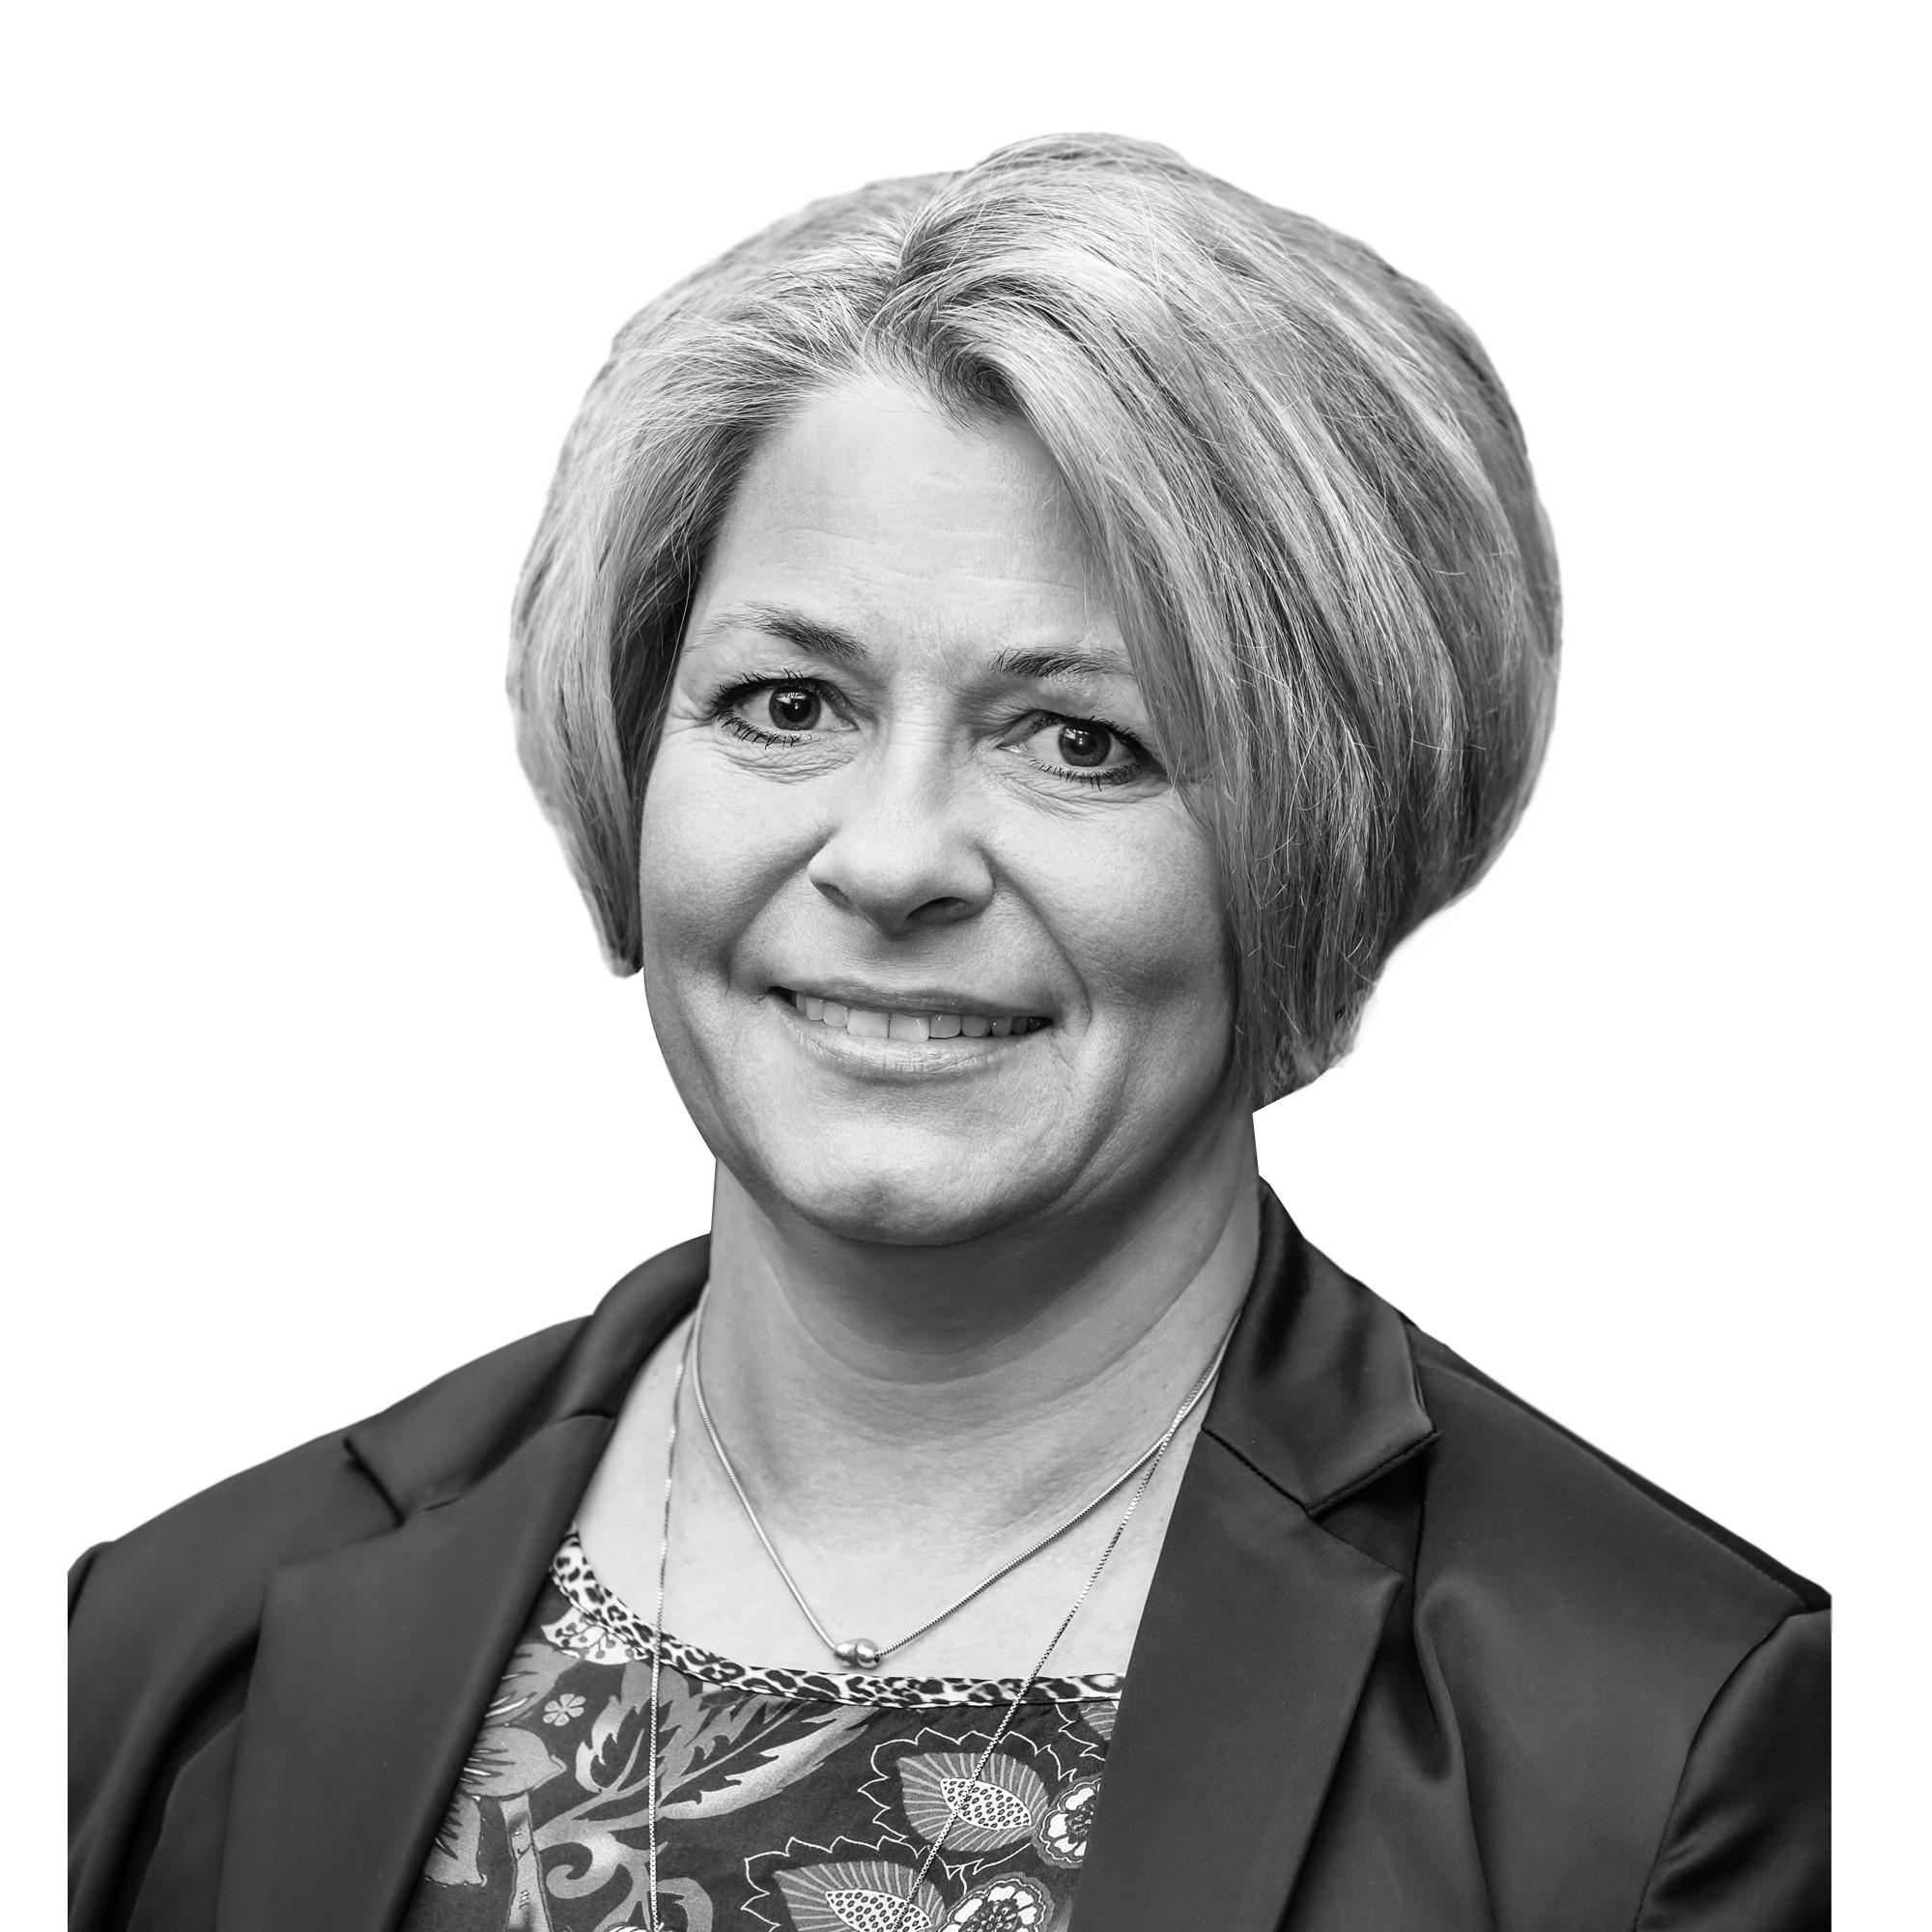 Charlotte Langfrits Clausen